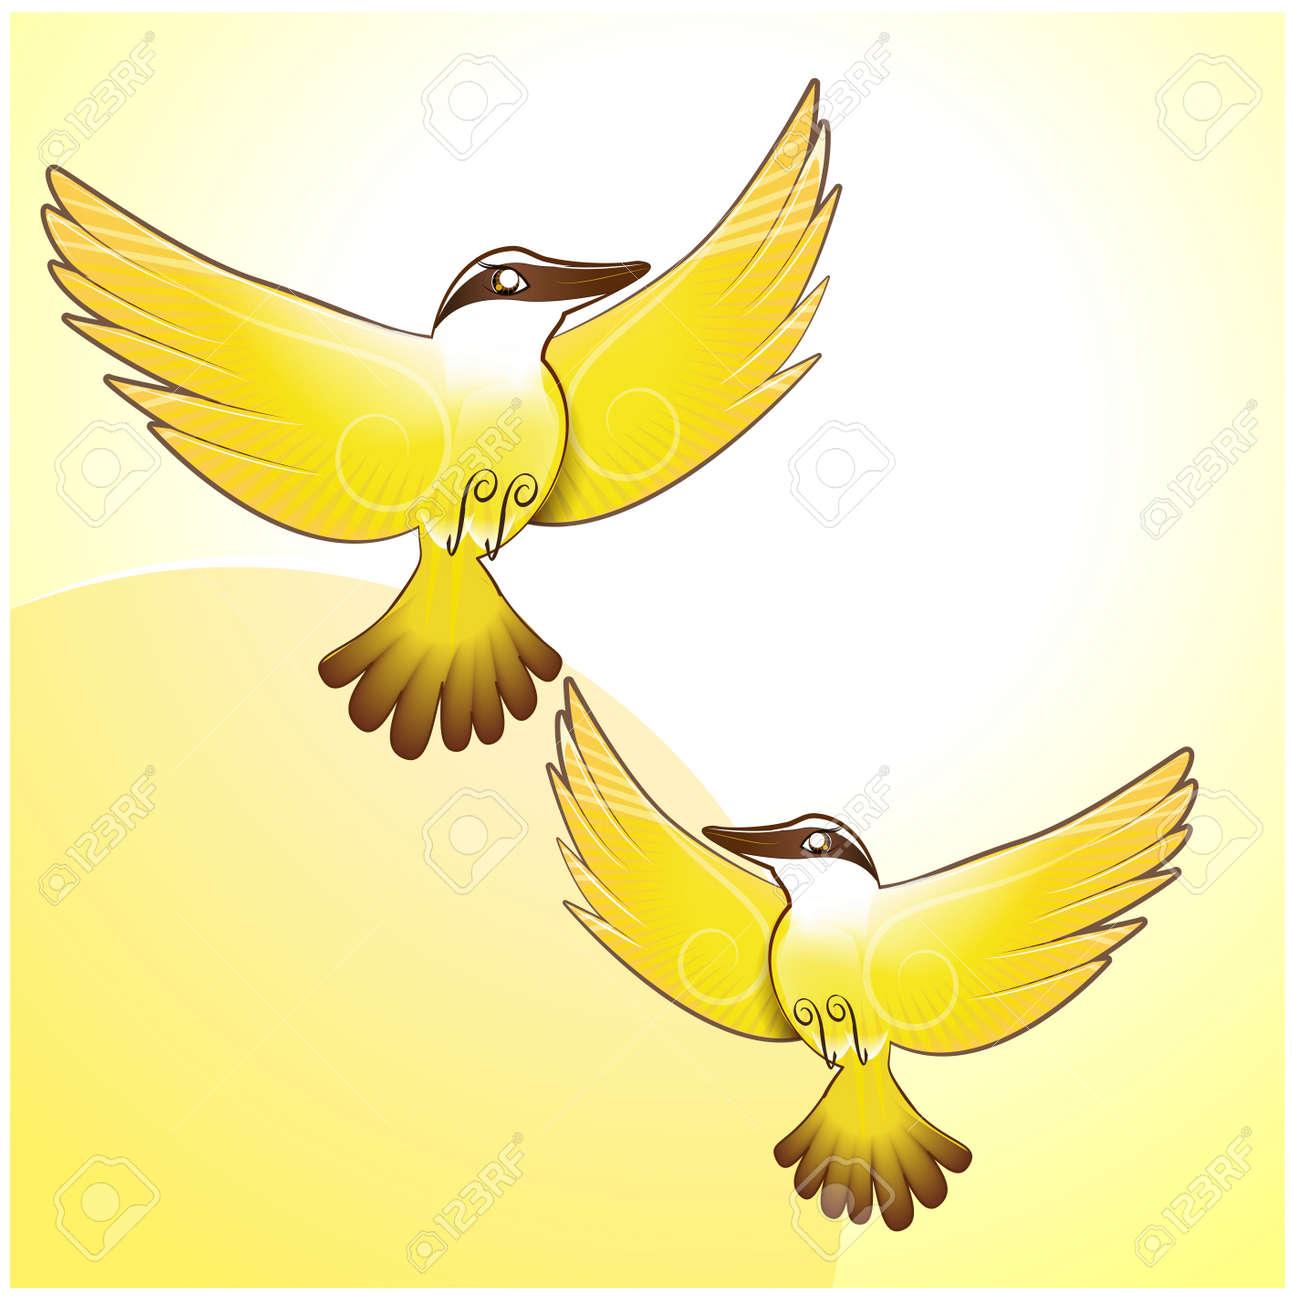 Bem Te Vi Cute Yellow Bird Illustration Vector - 166722174